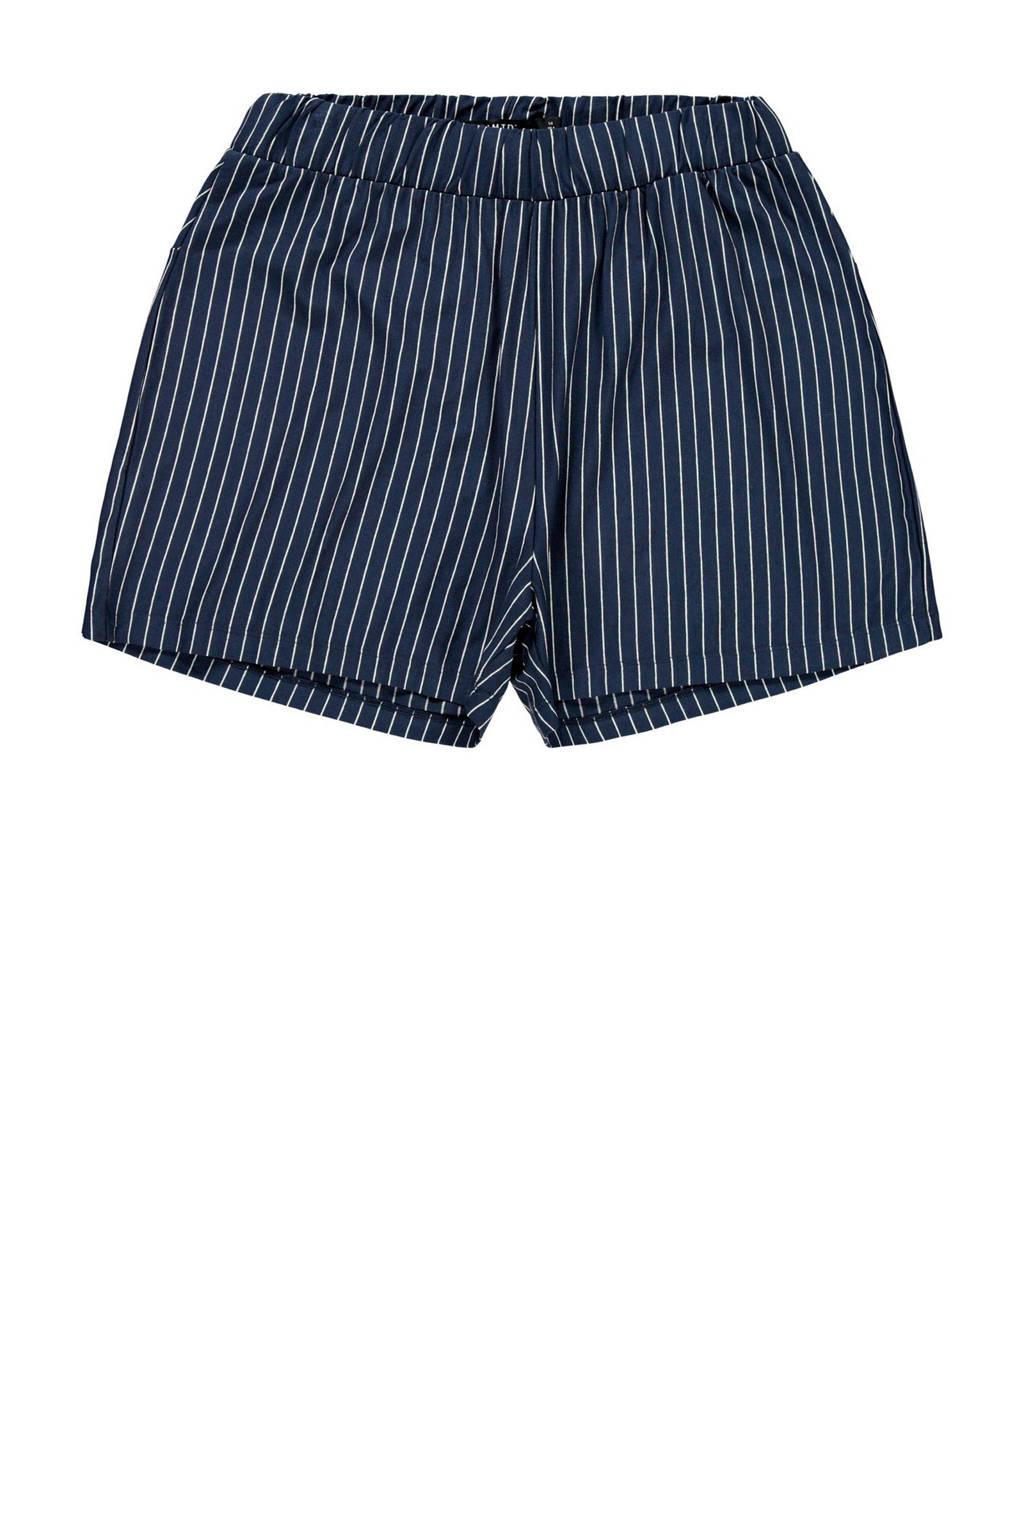 LMTD gestreepte short Babara donkerblauw/wit, Donkerblauw/wit